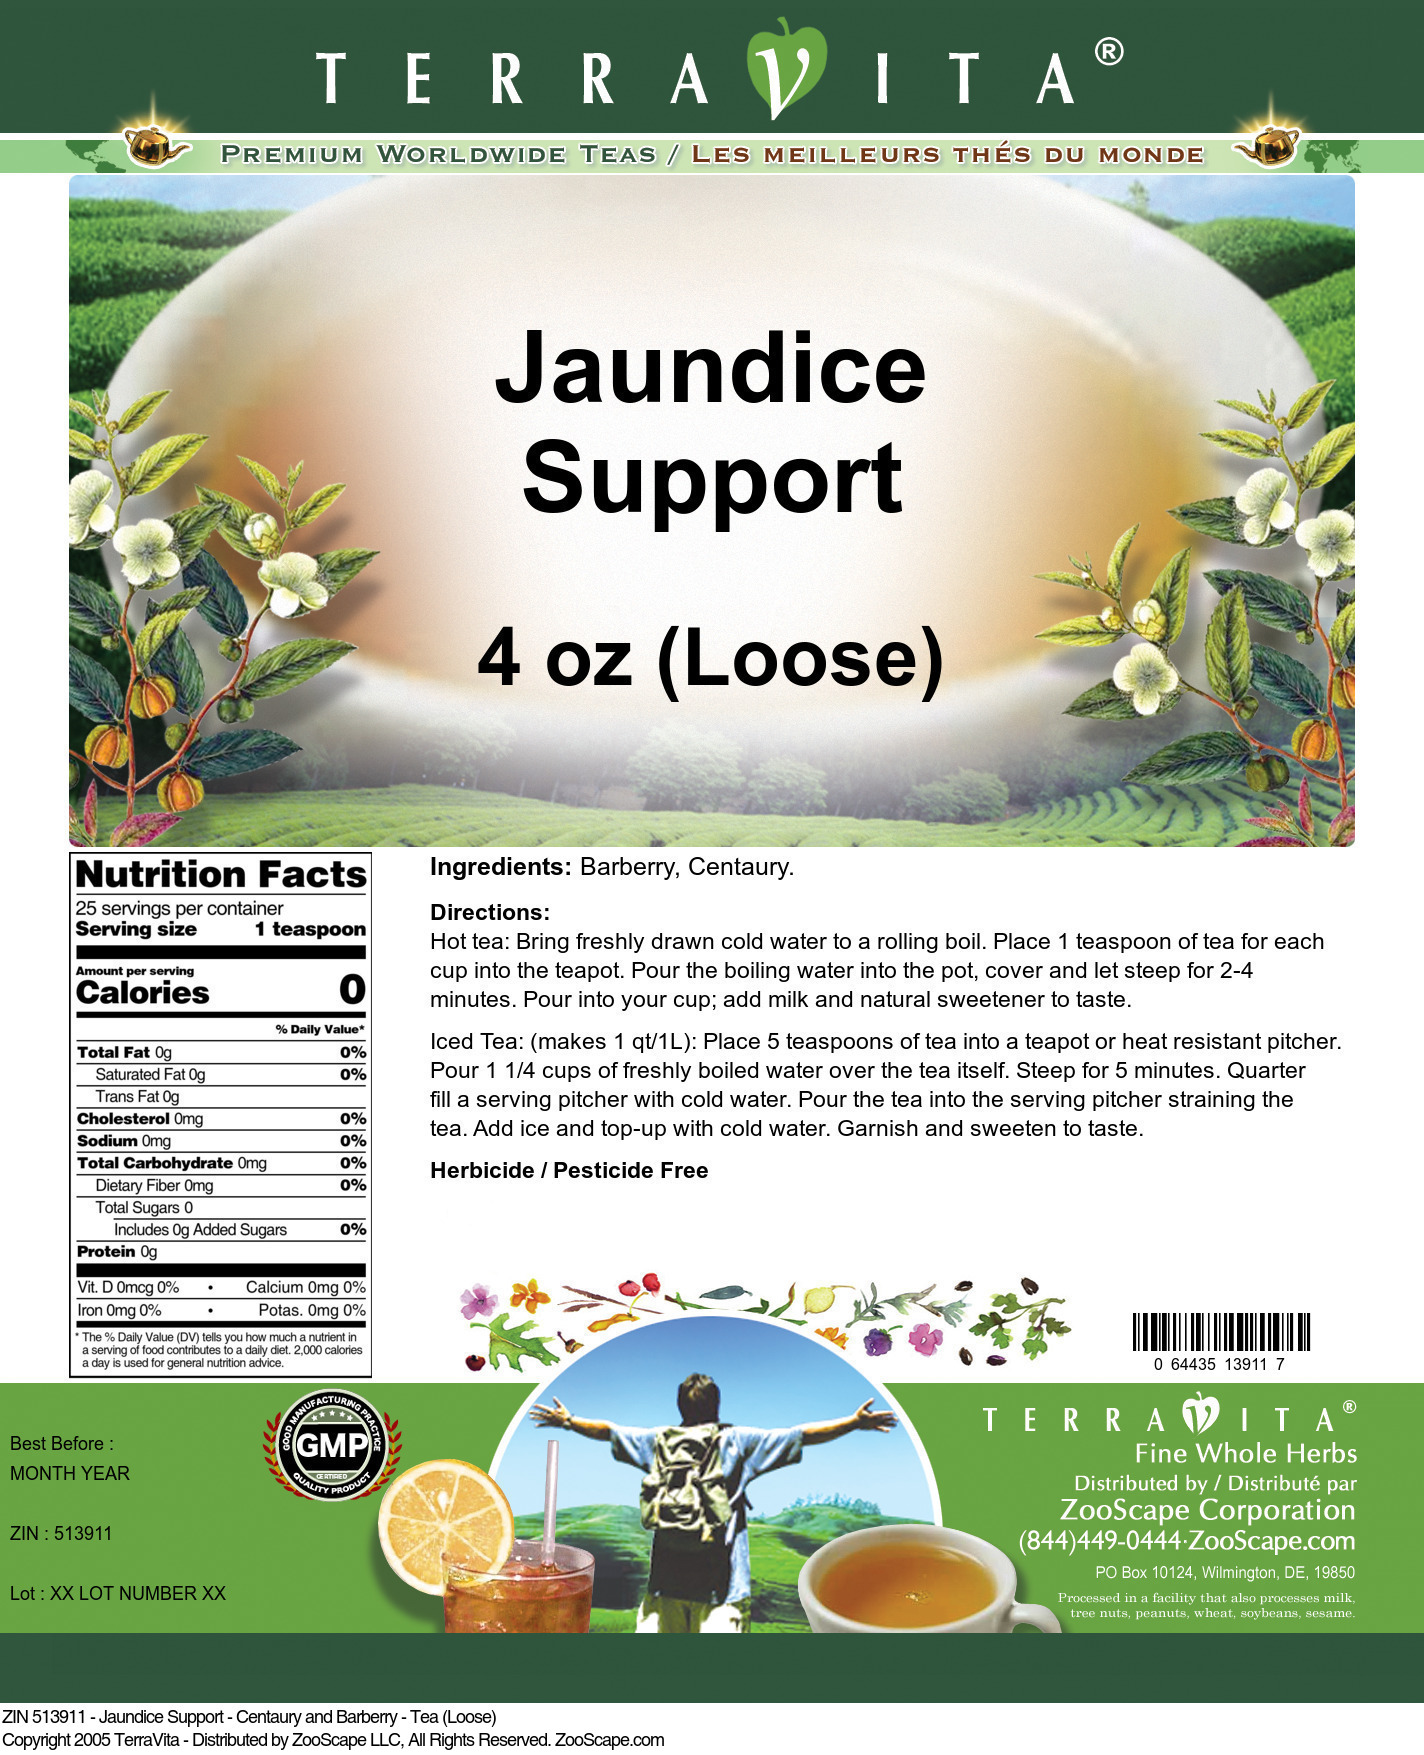 Jaundice Support